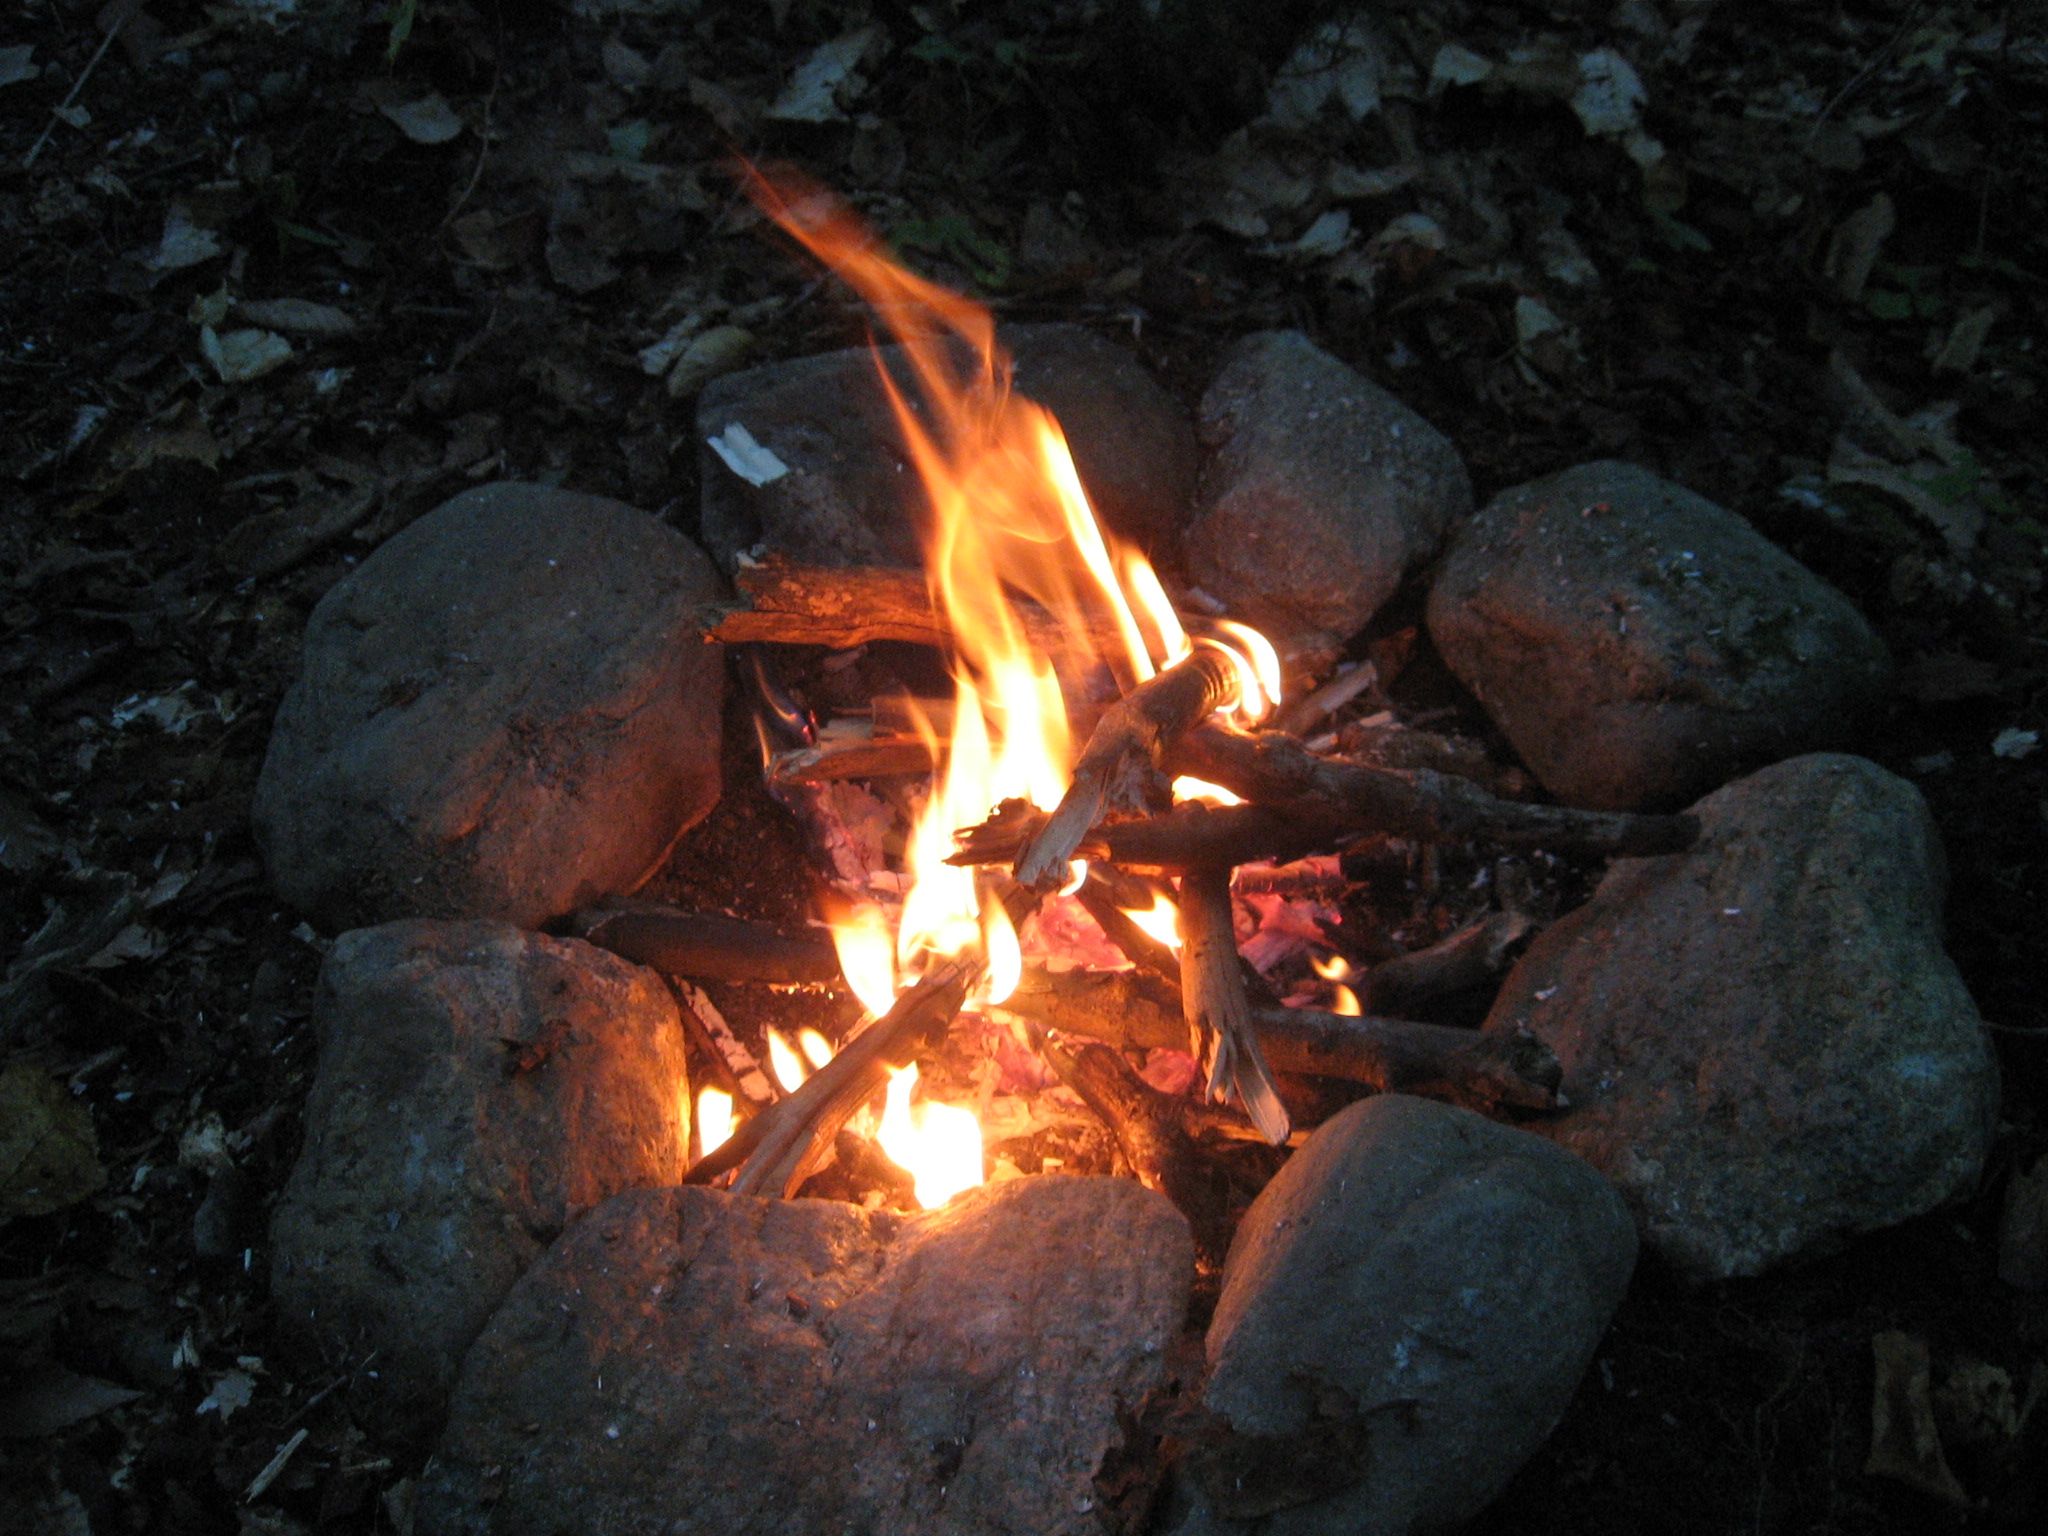 Fall Desktop Wallpaper Load Woods Wanderer 187 Campfire Meditation